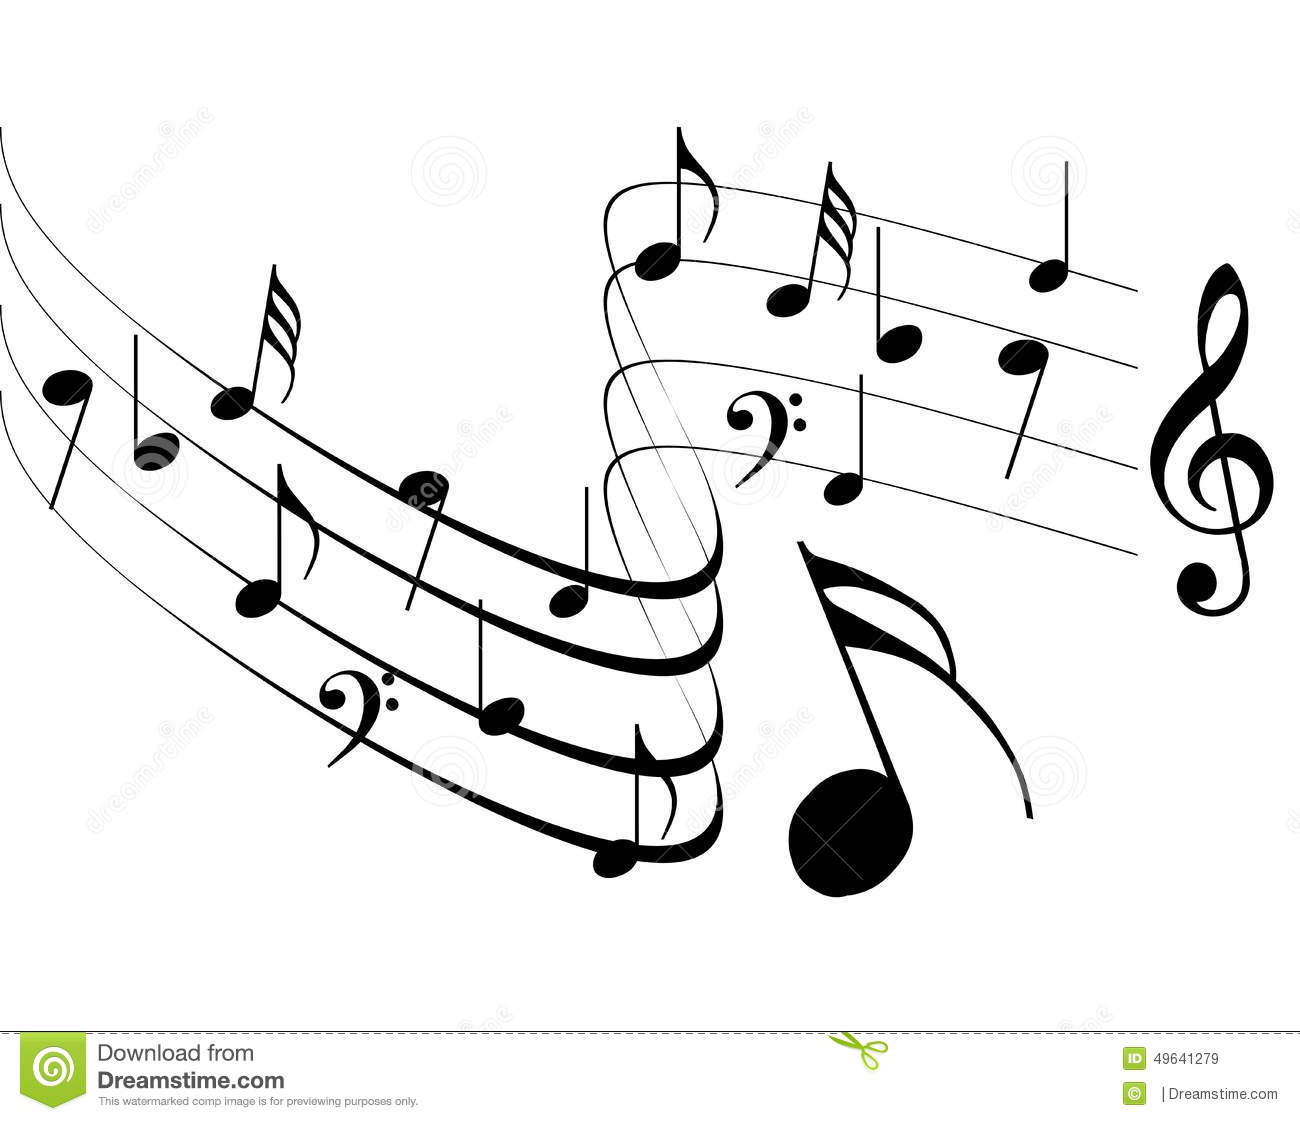 Music Clip Art Black and White Designs